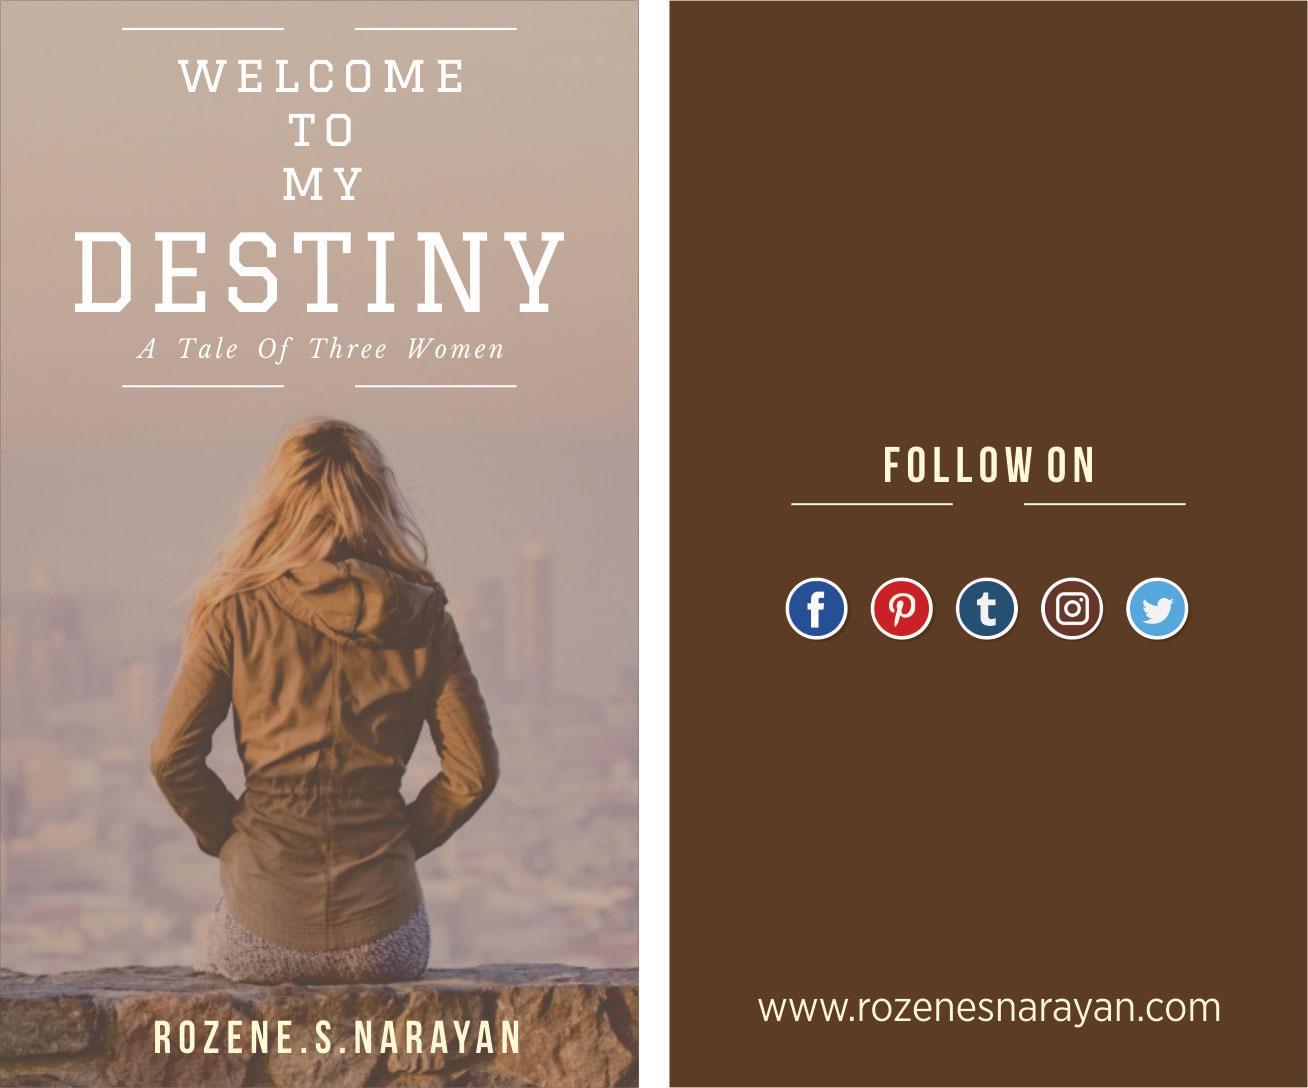 Welcome to my destiny